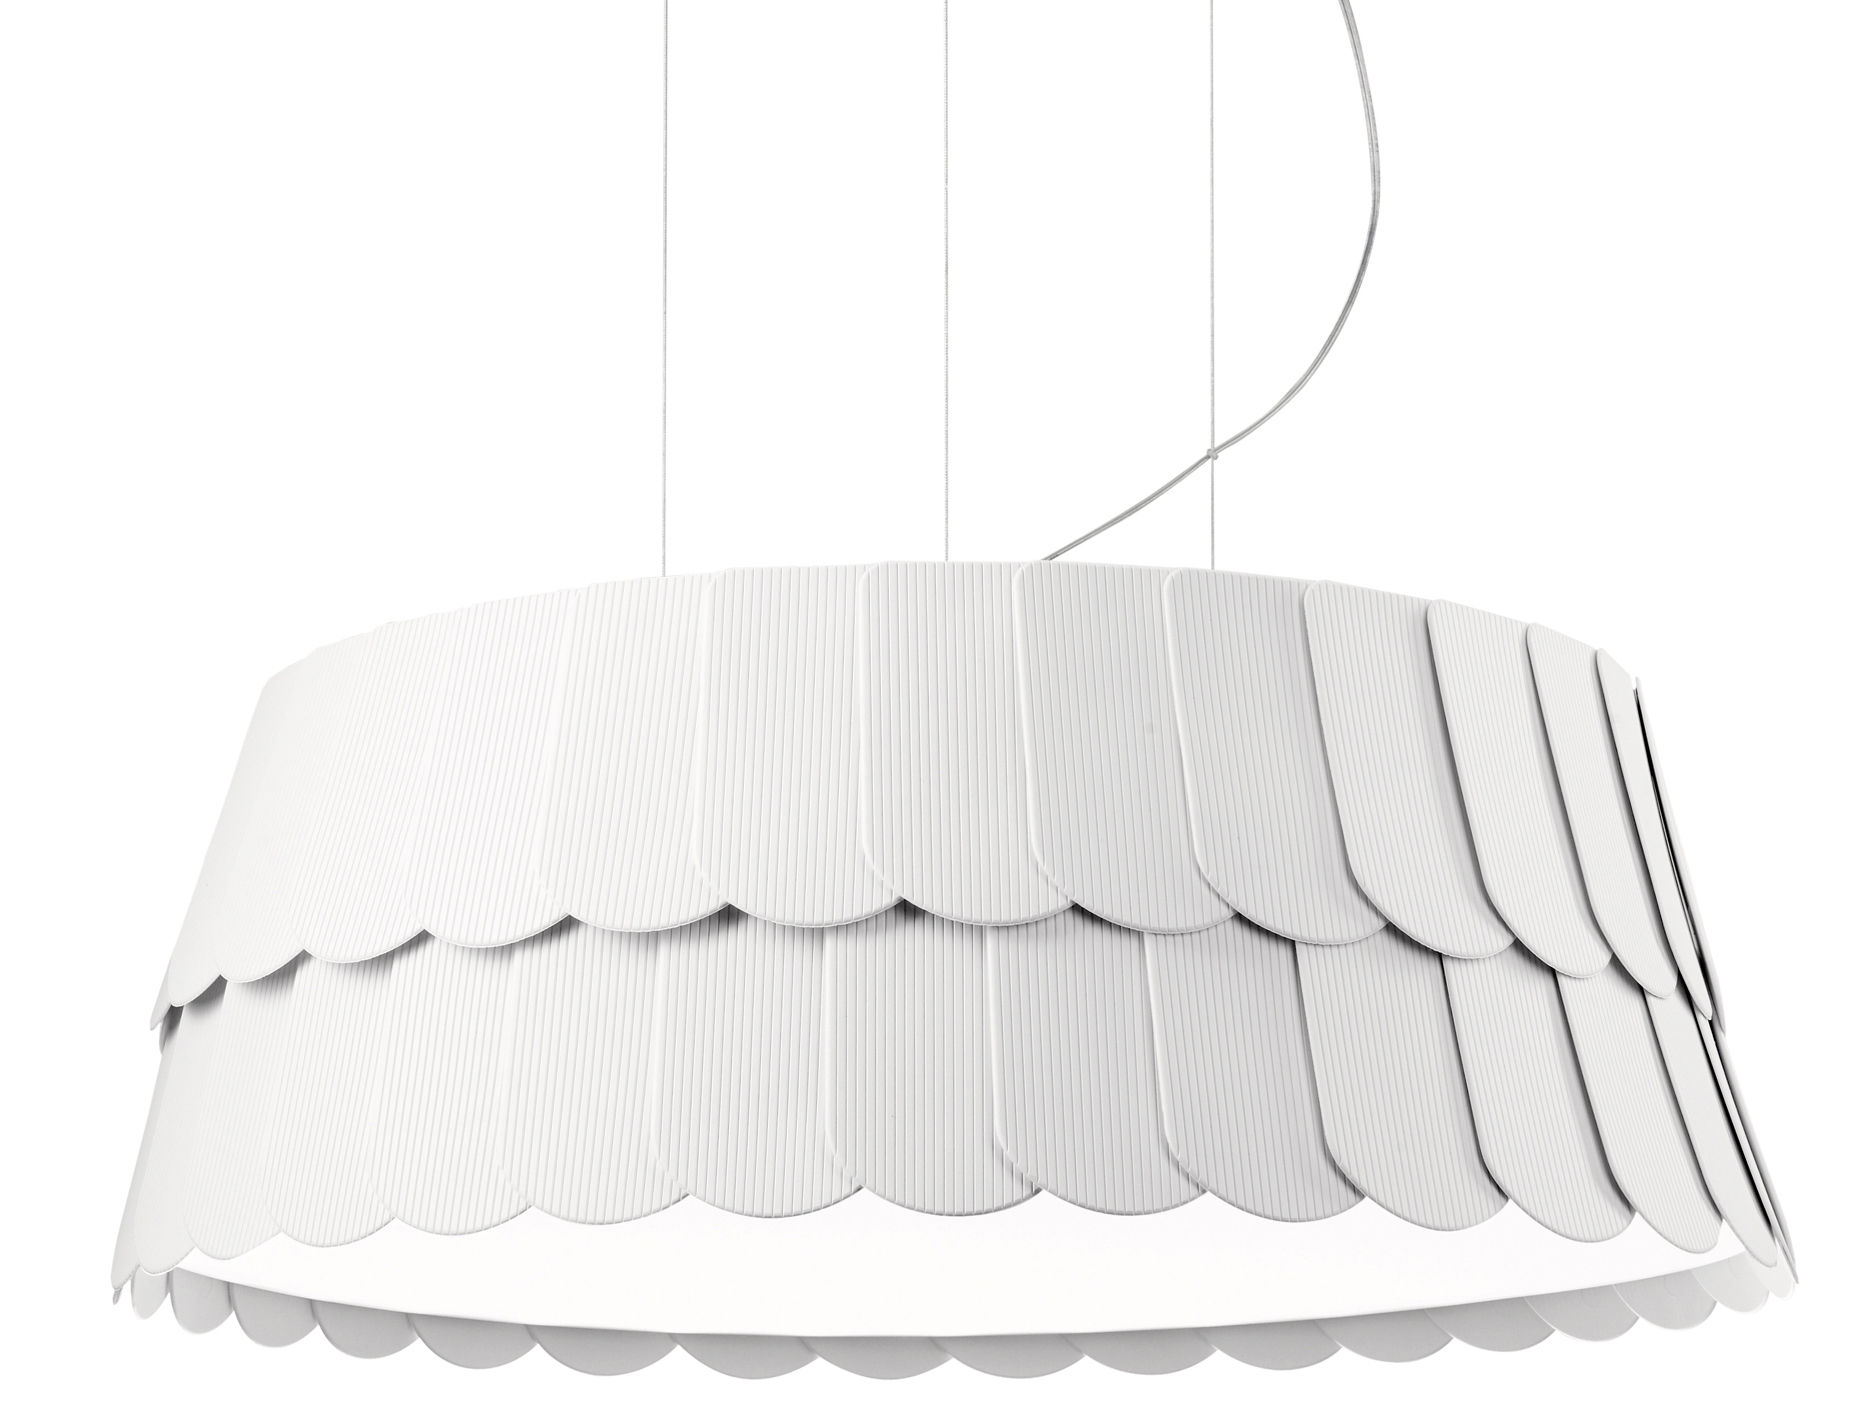 Luminaire - Suspensions - Suspension Roofer Ø 59 x H 22,5 cm - Fabbian - Blanc - Gomme